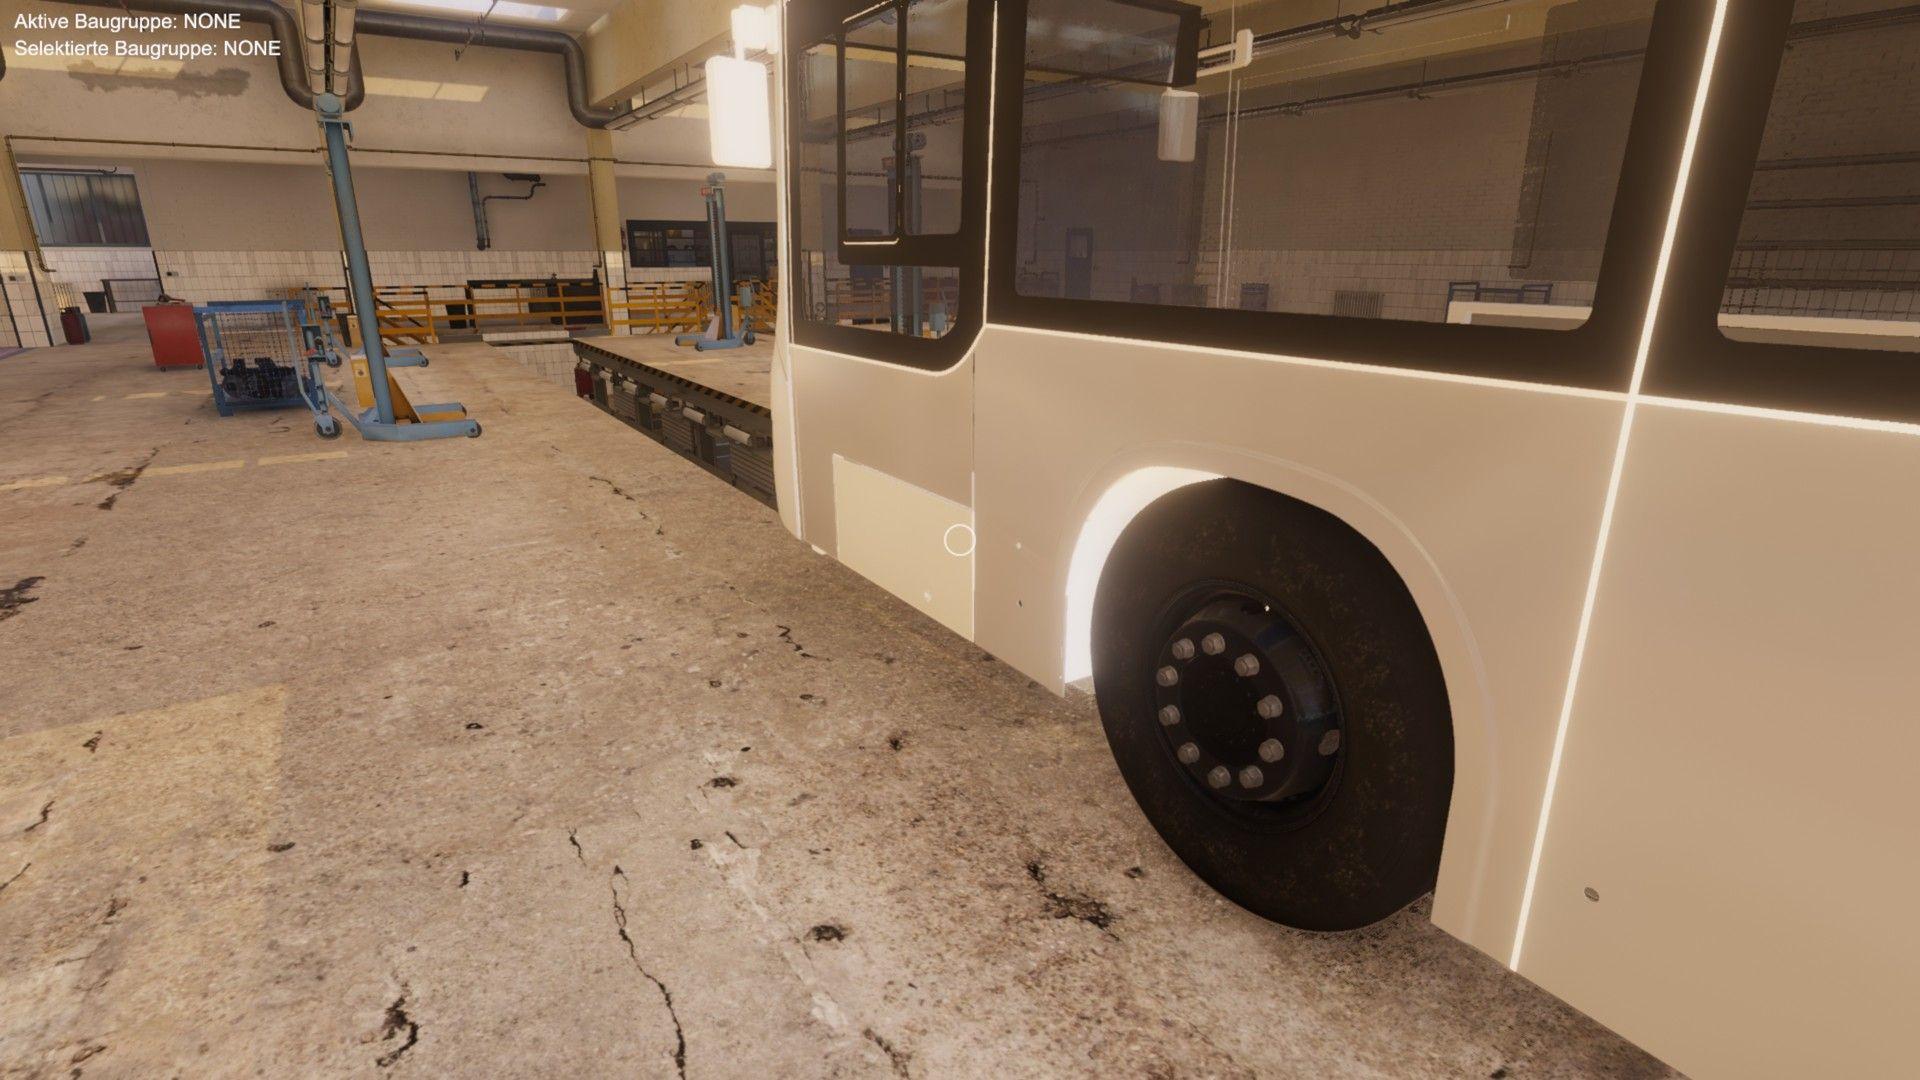 Bus Mechanic Simulator Ad , Ad, Bus, Mechanic,